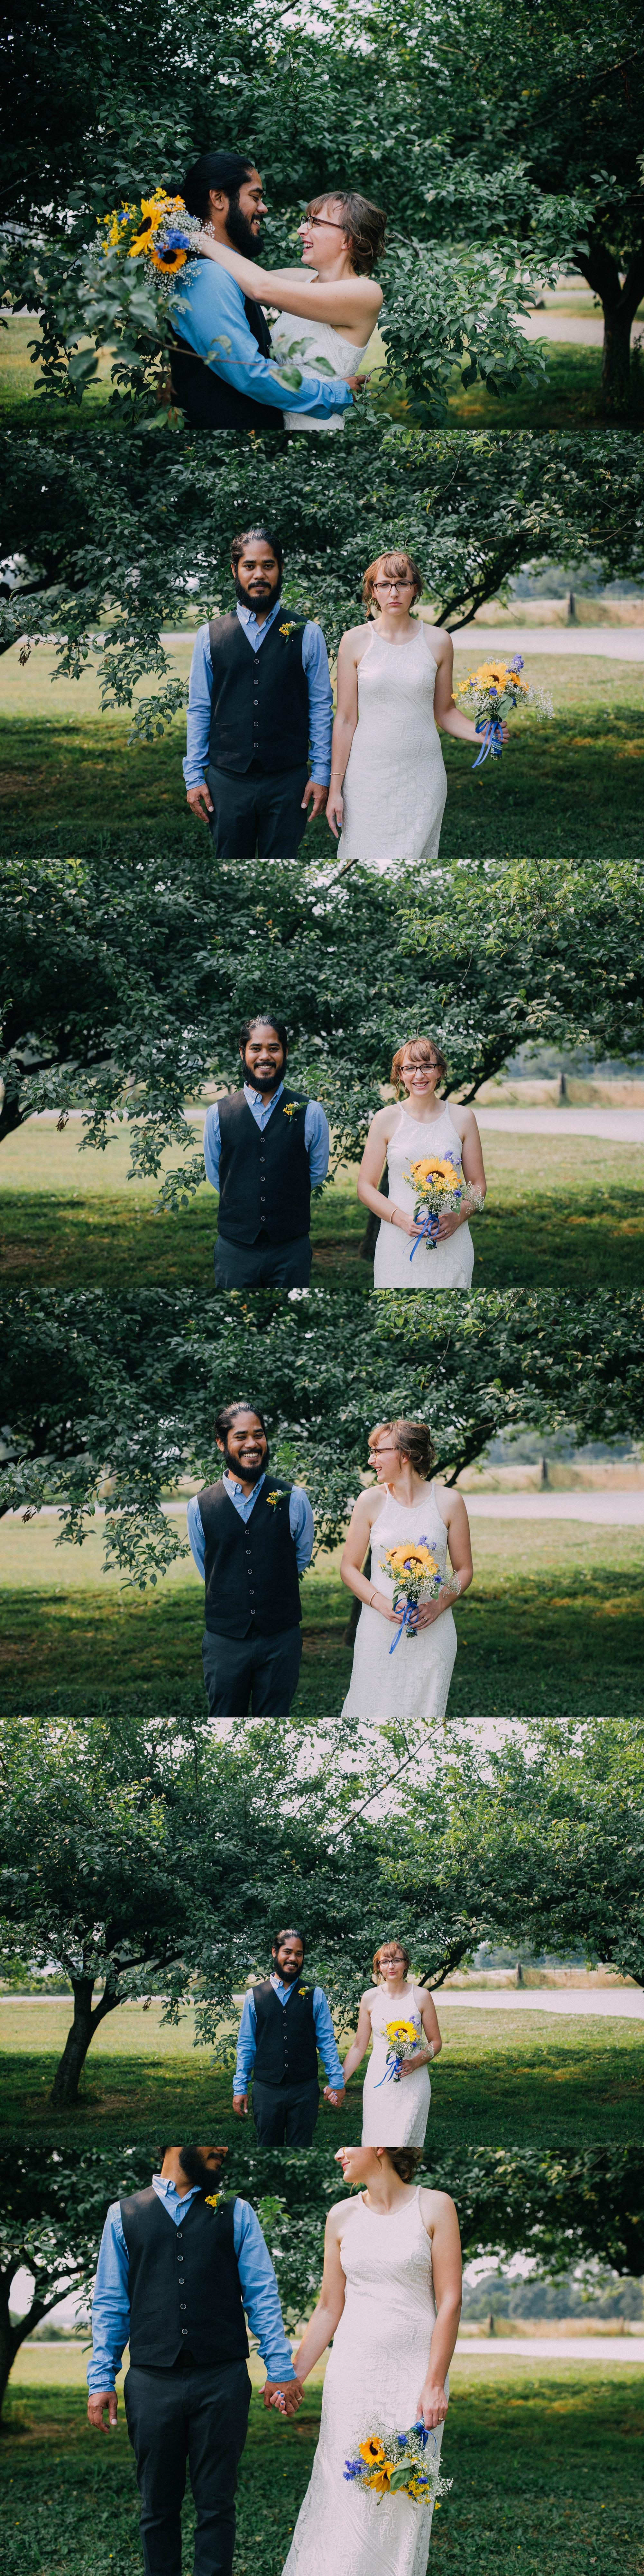 ashley_vos_seattle_ wedding_photographer_0461.jpg